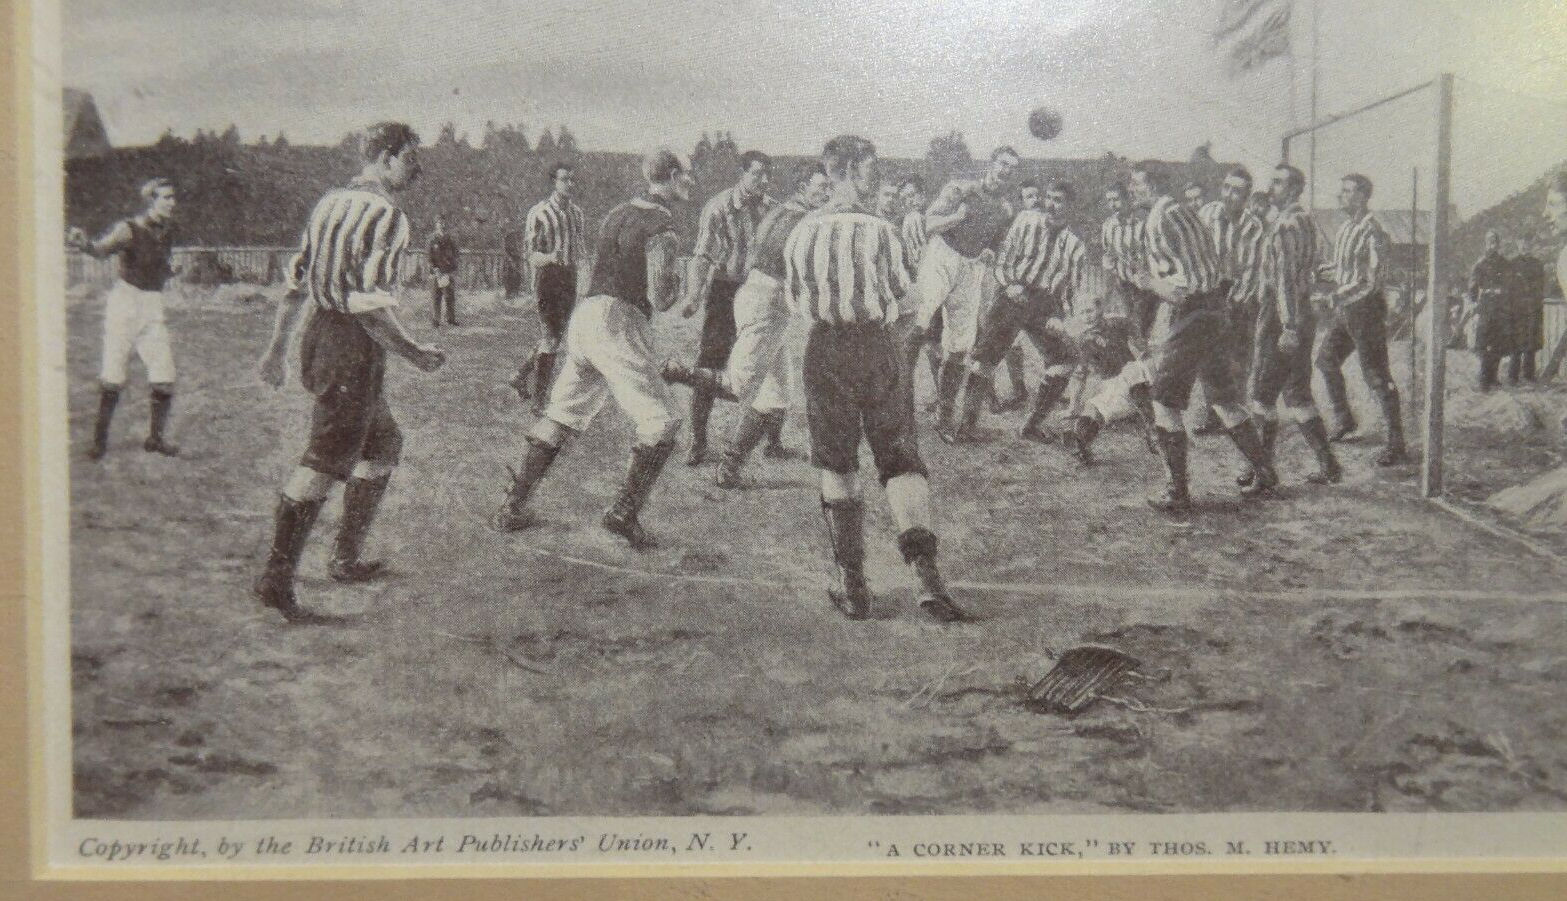 A portion of the framed print - 'A Corner Kick'.